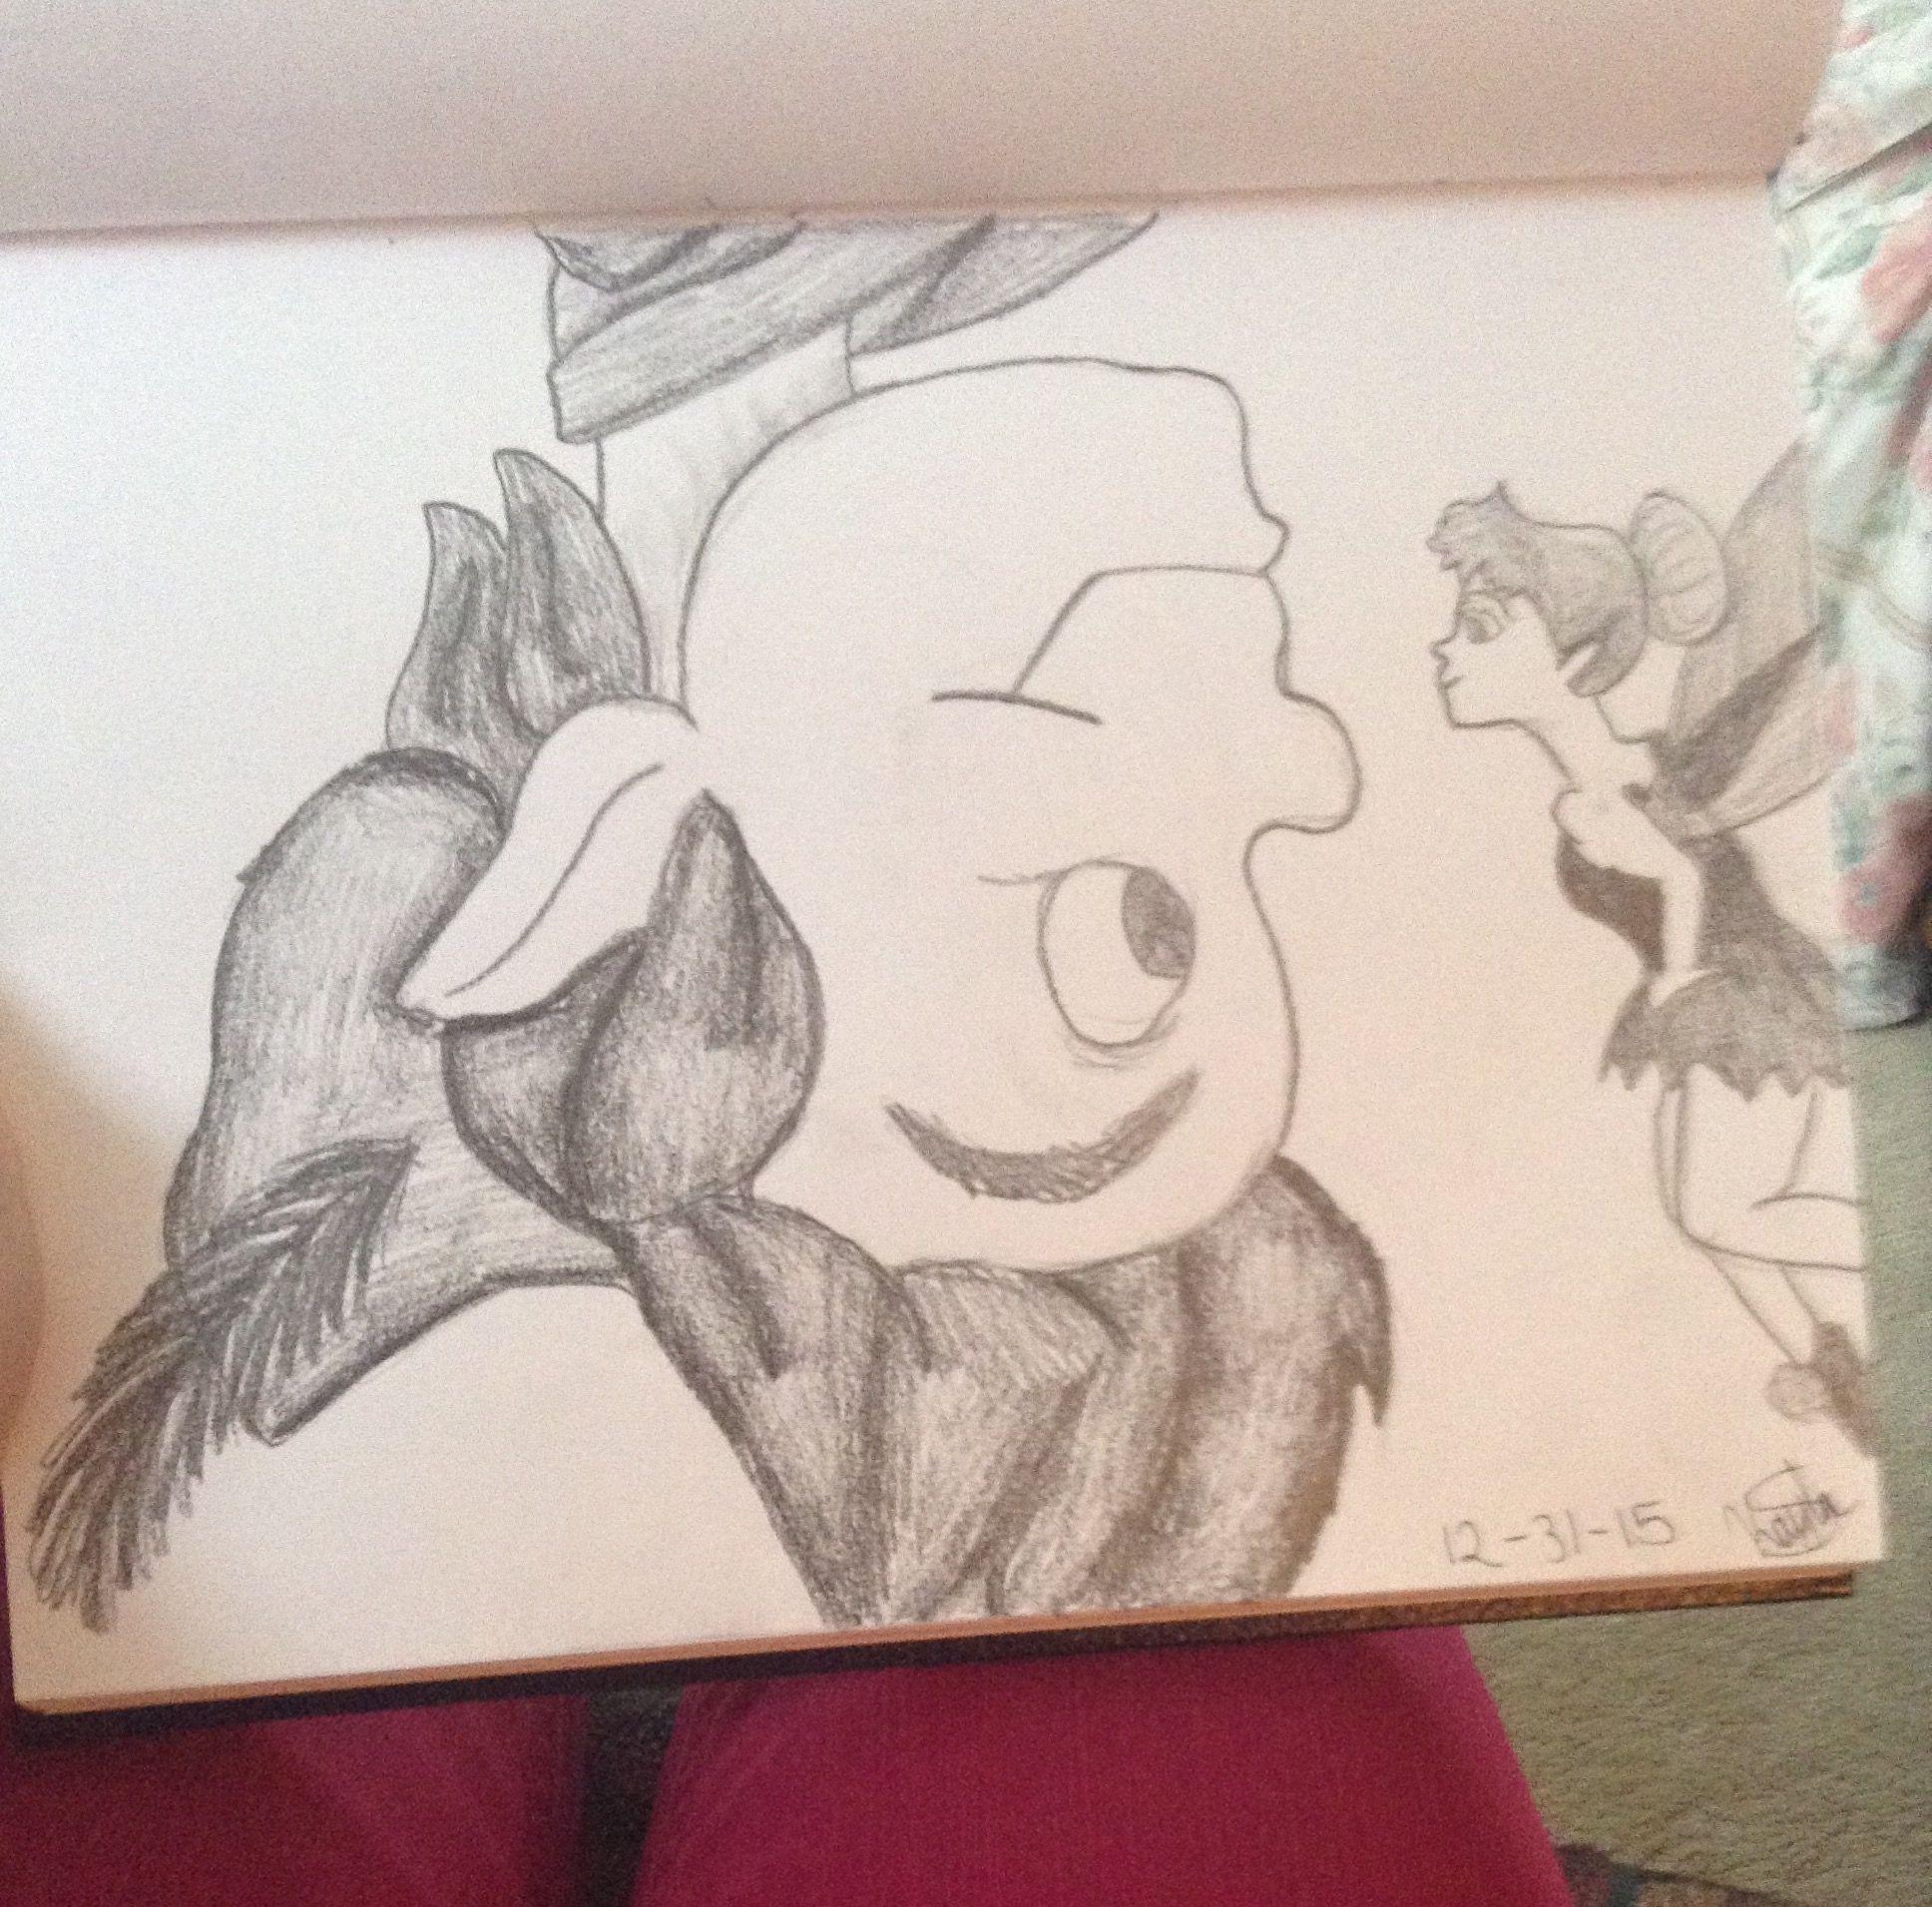 Upside Down Art Peter Pan Hanging Upside Down And Tink My Art Pinterest